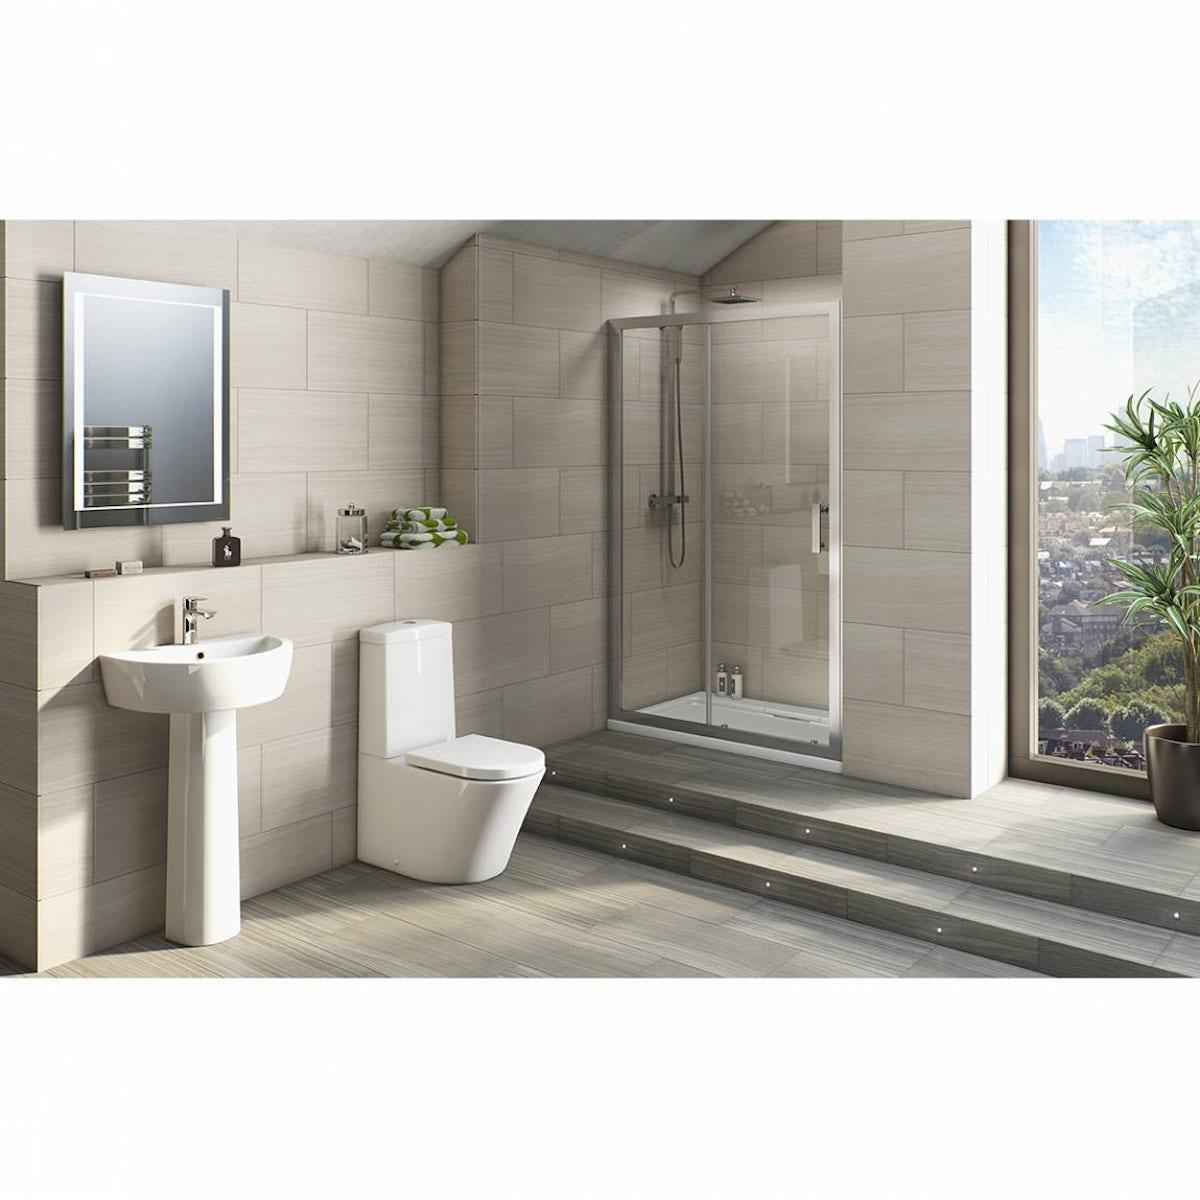 Plumbs bathroom suites - Arc Bathroom Suite From Victoria Plumb Bathroom Suites Housetohome